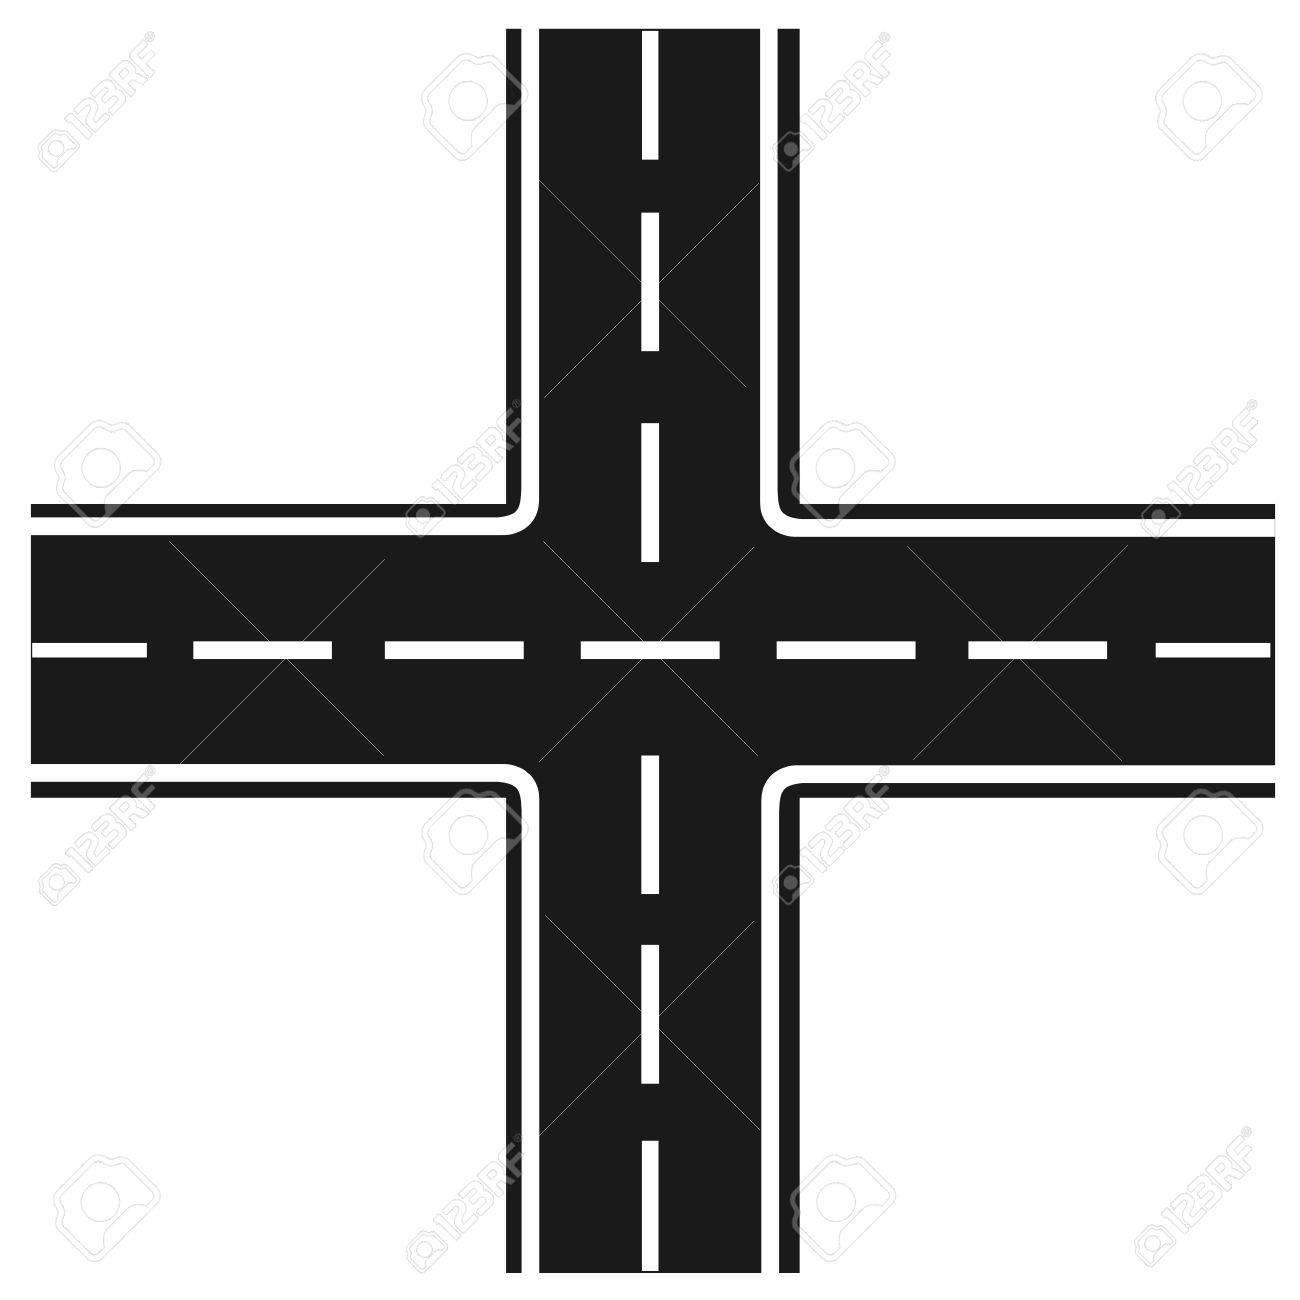 road junction, Illustration crossroads, highway intersection, - 58018511